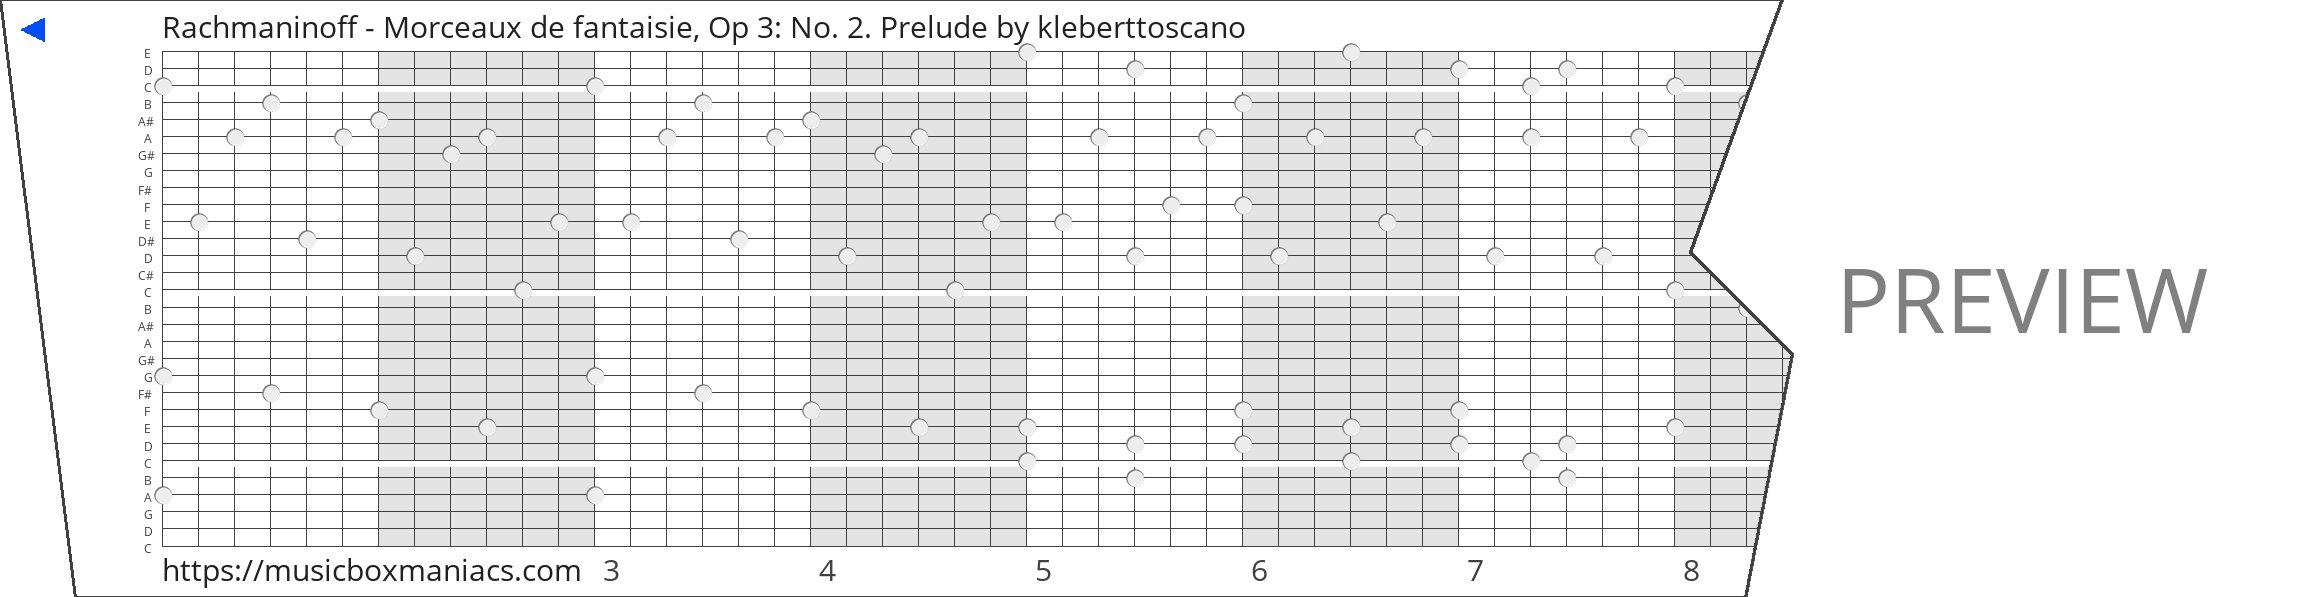 Rachmaninoff - Morceaux de fantaisie, Op 3: No. 2. Prelude 30 note music box paper strip